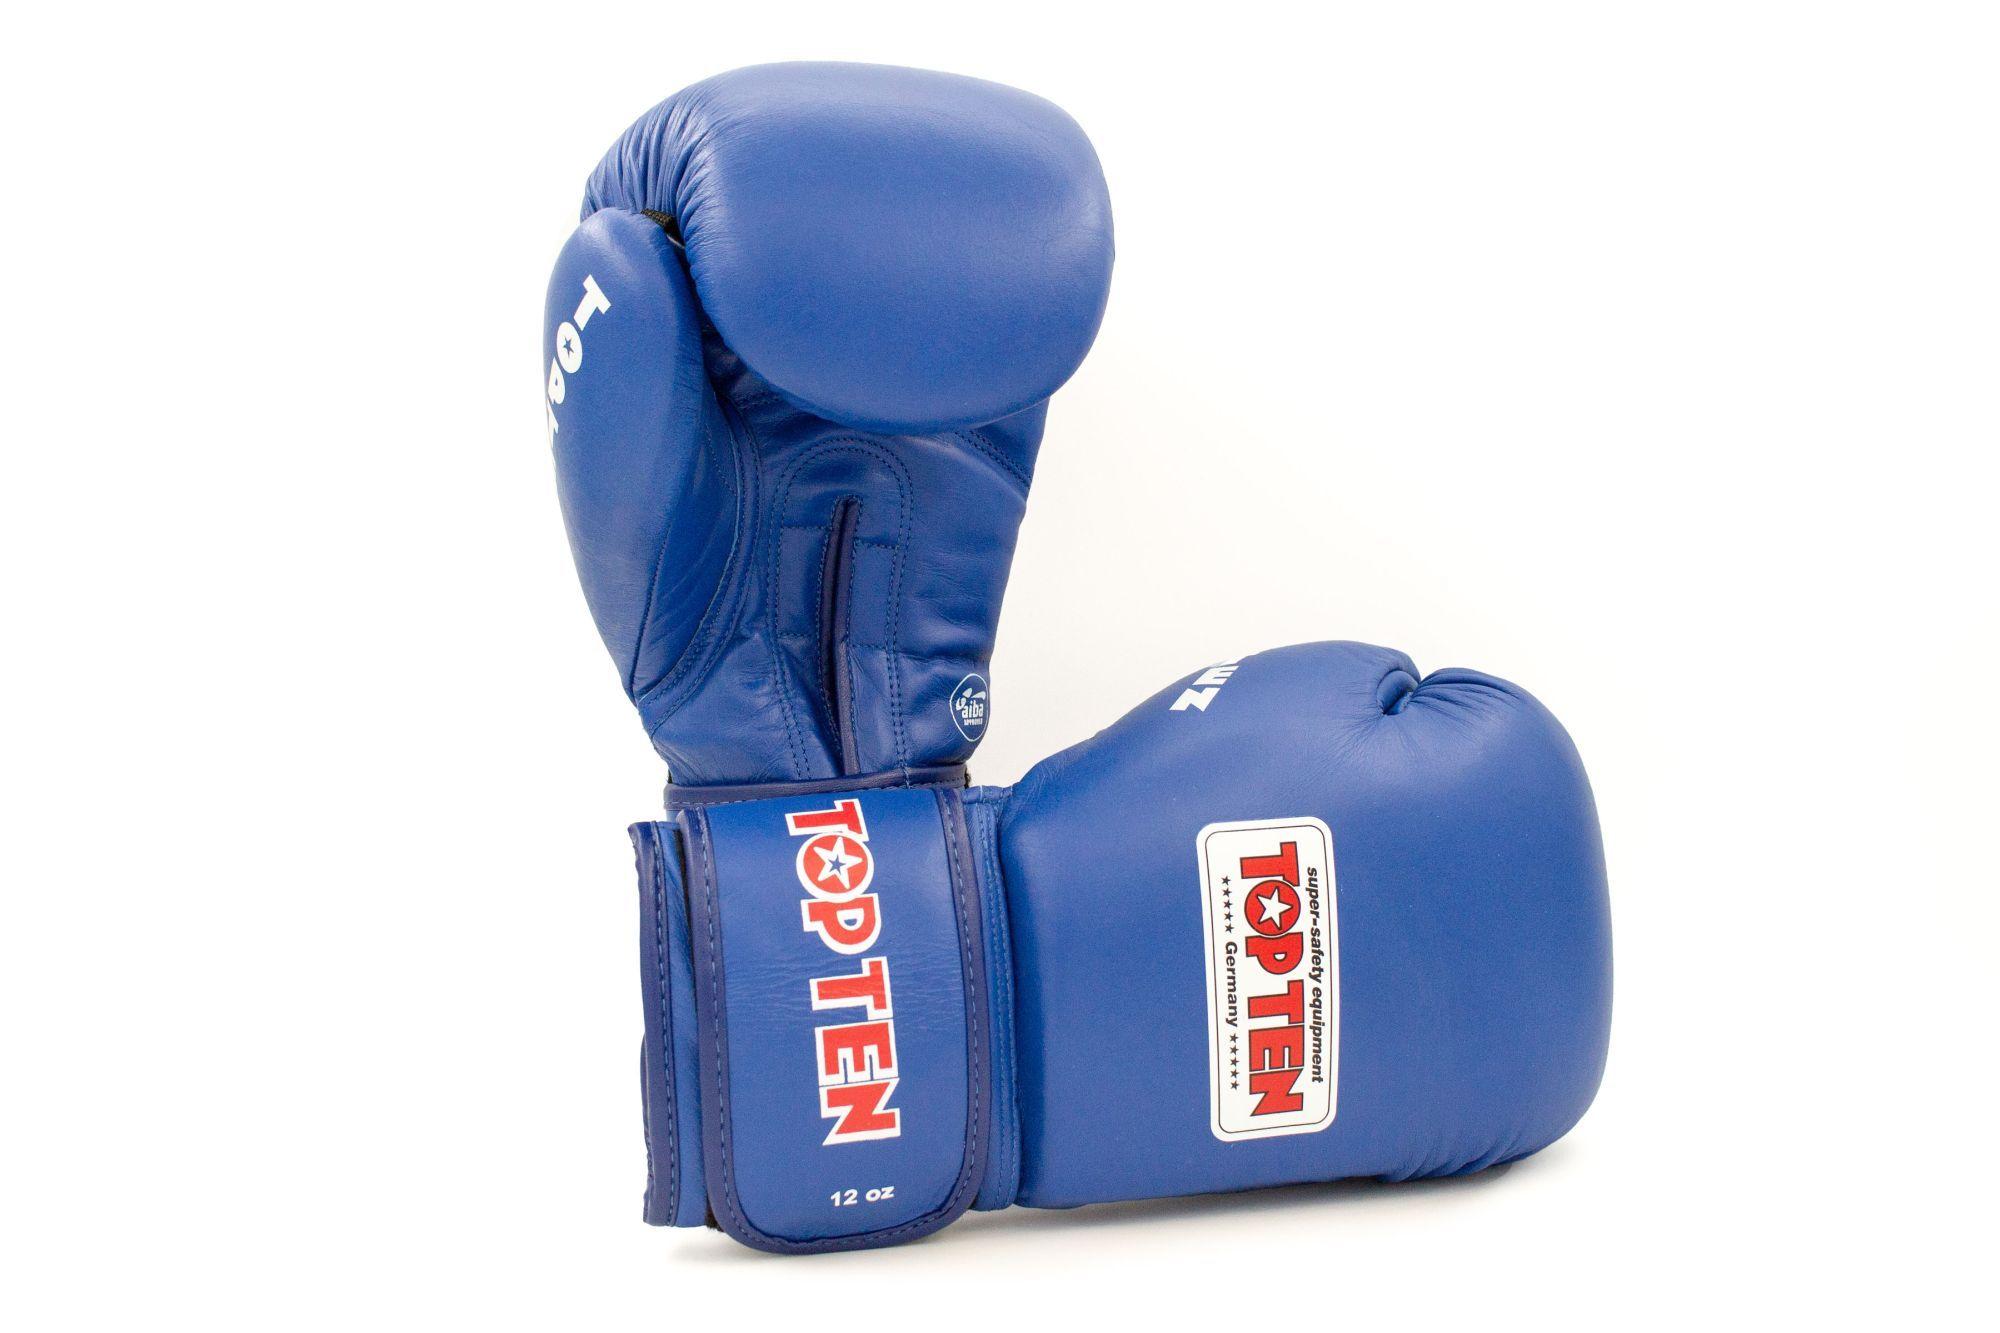 Boks rukavice TOP TEN AIBA 12oz